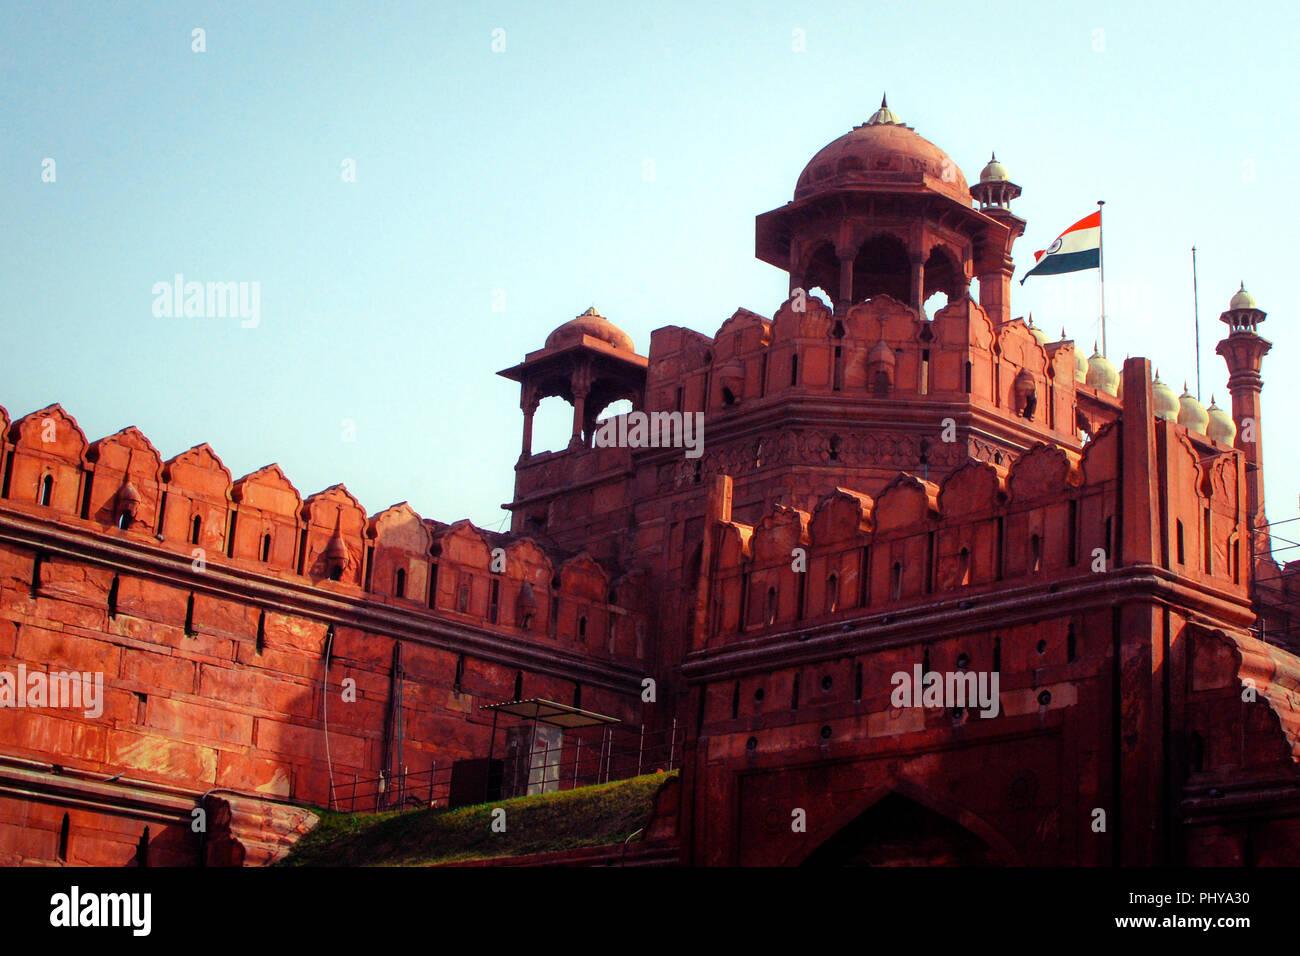 Unesco world heritage site, Red Fort, New Delhi, India. Stock Photo